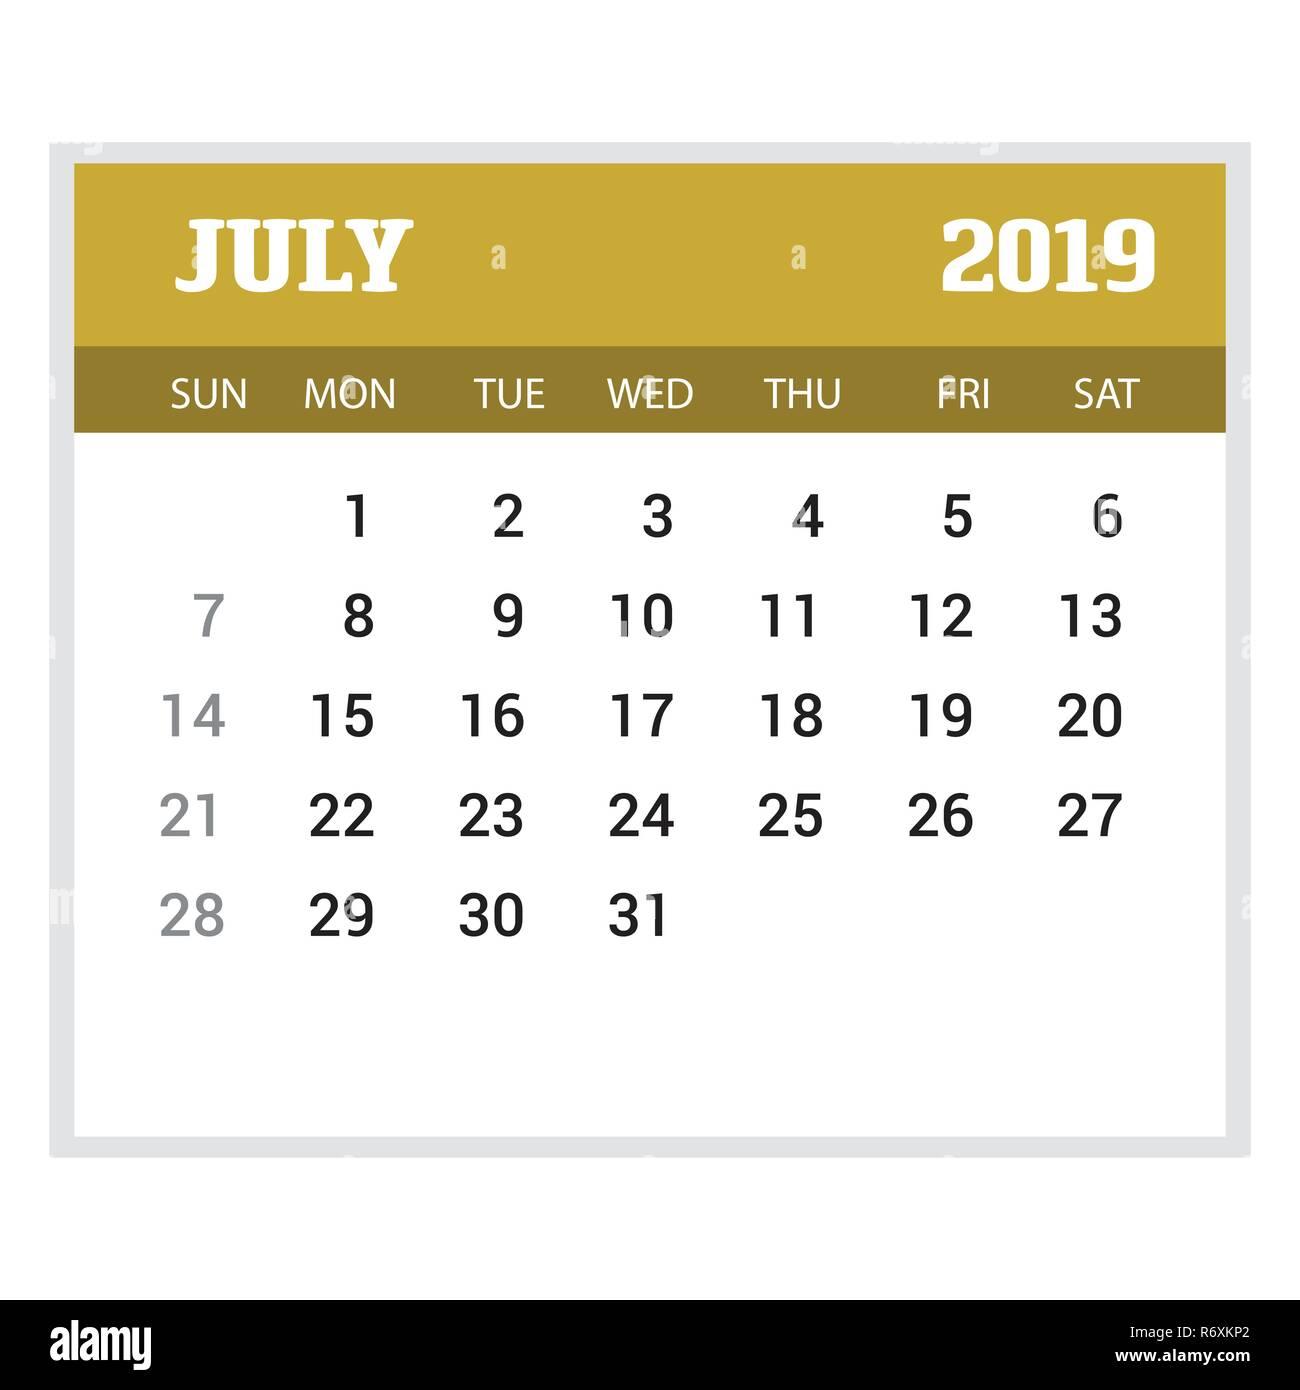 july calender 2019